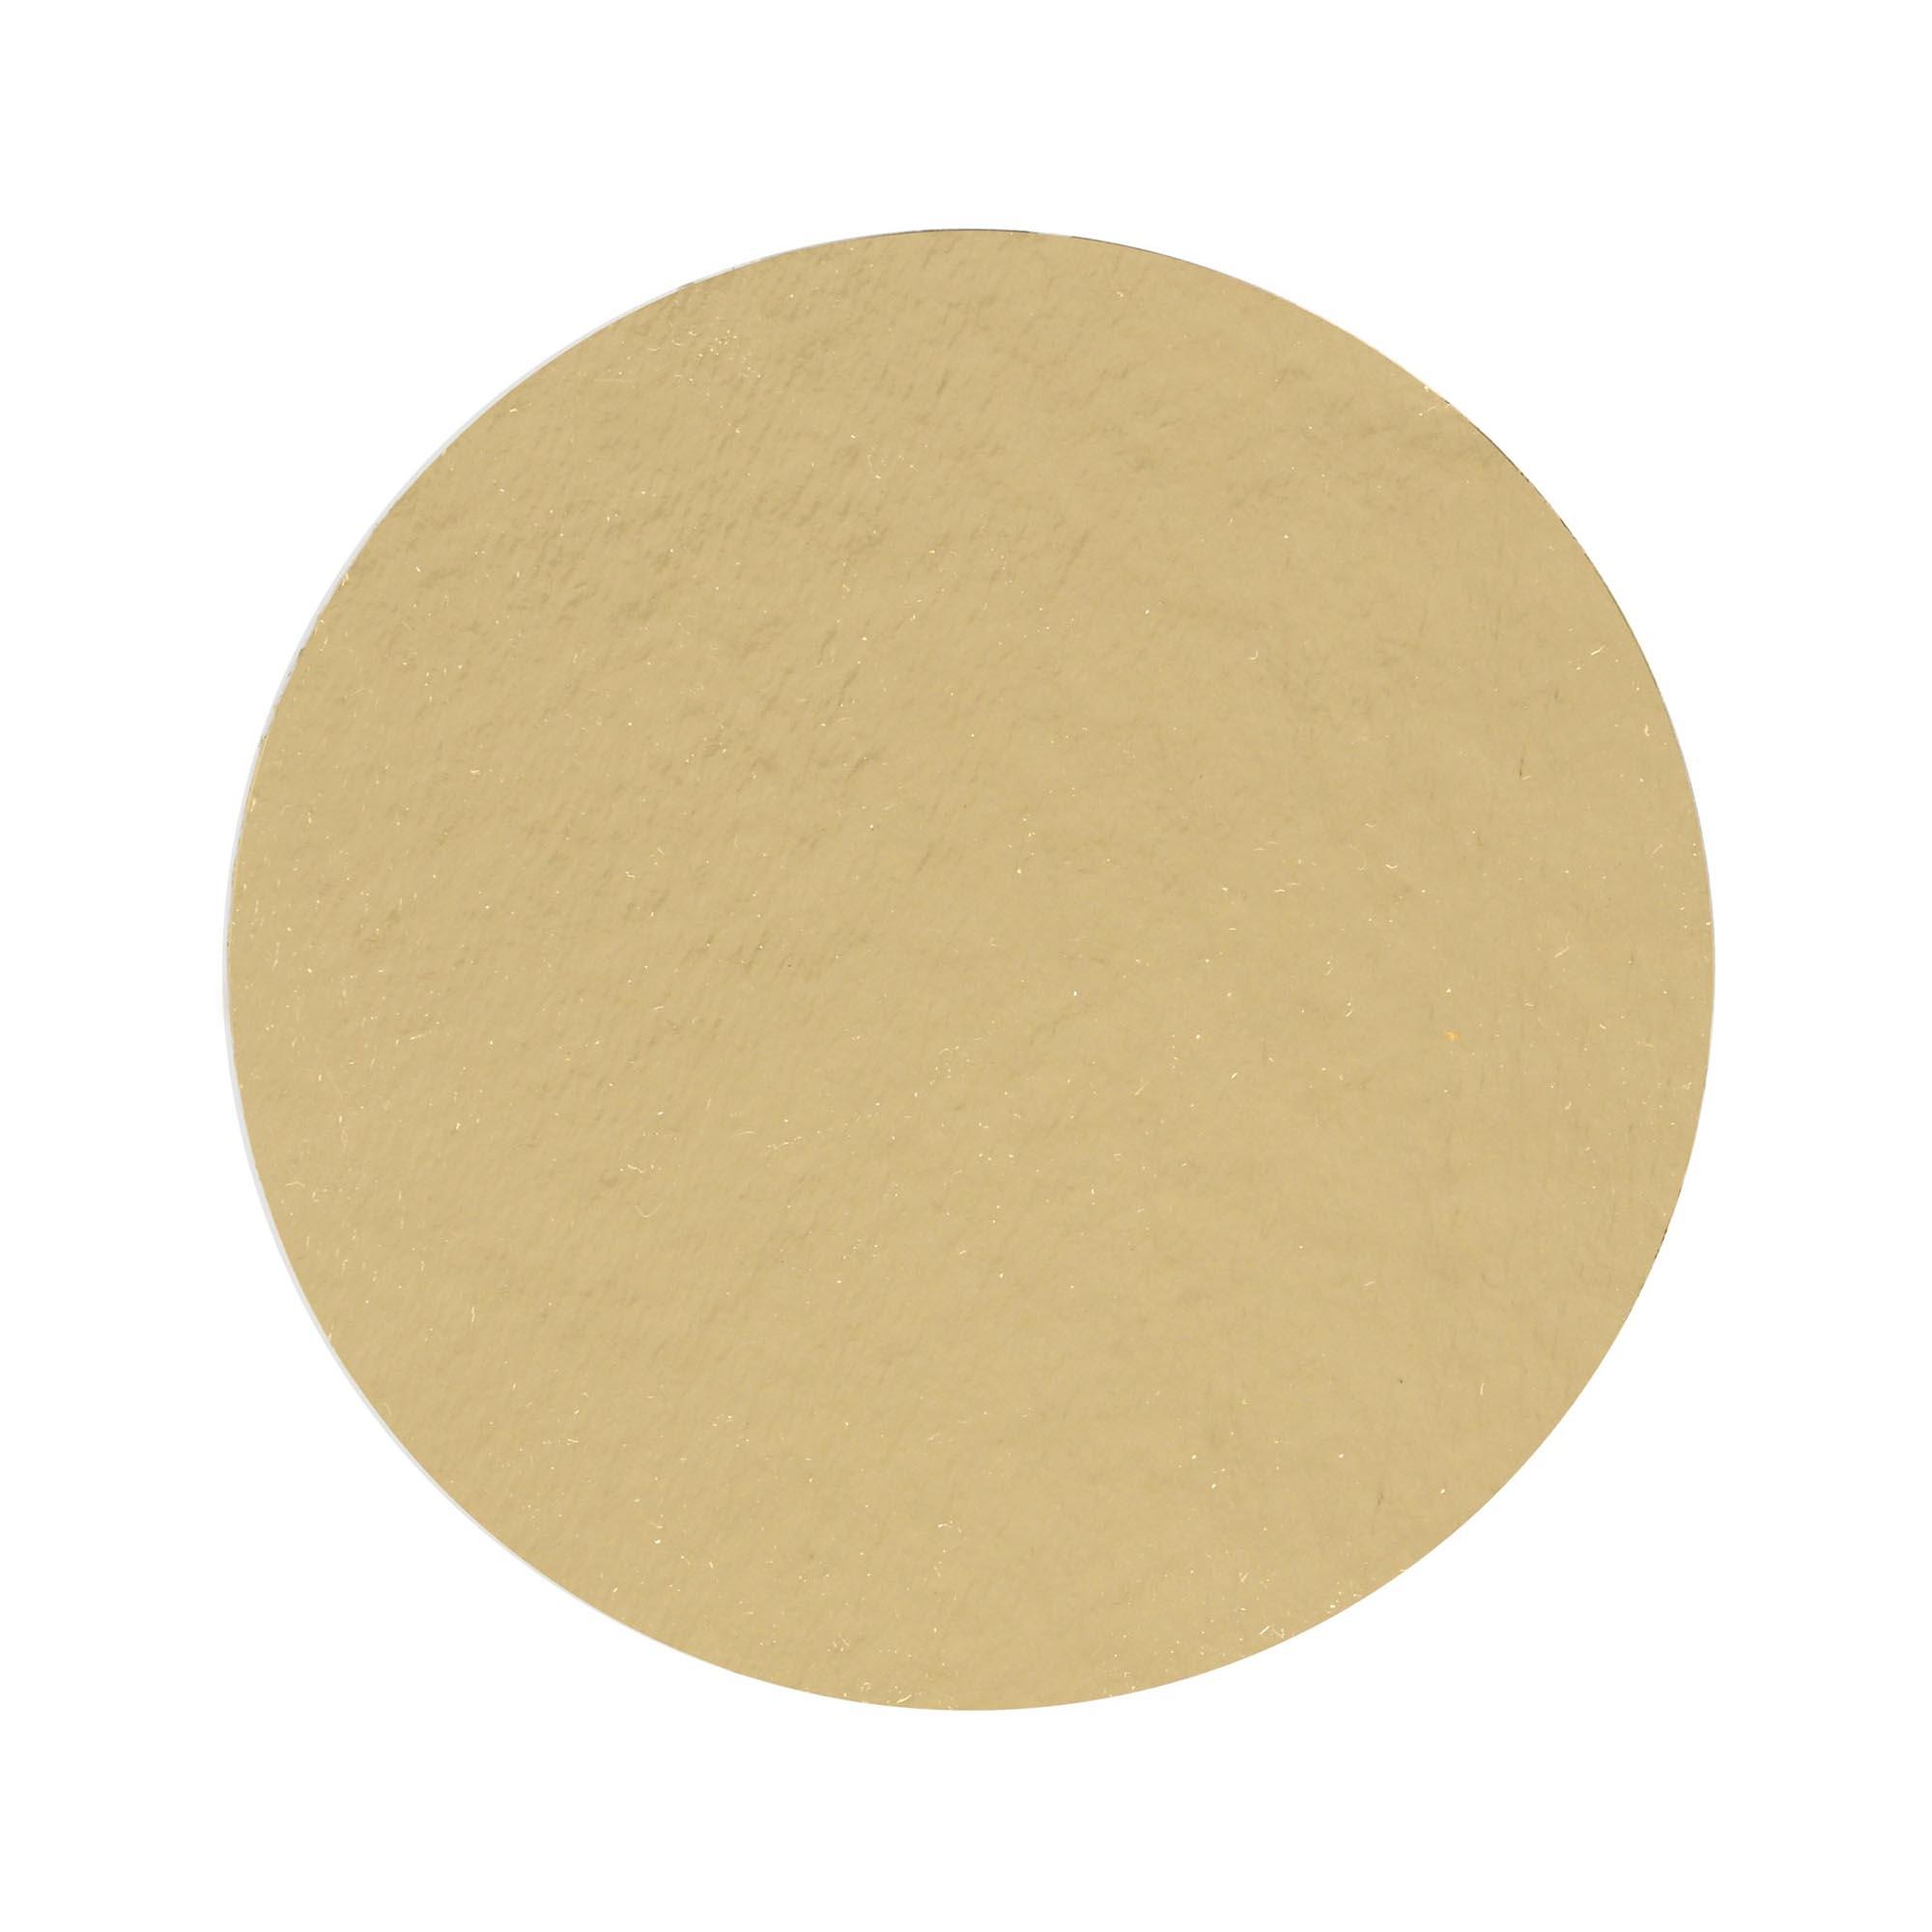 100 Bases Laminadas, Suporte P/ Doces, Disco 10cm - Ouro